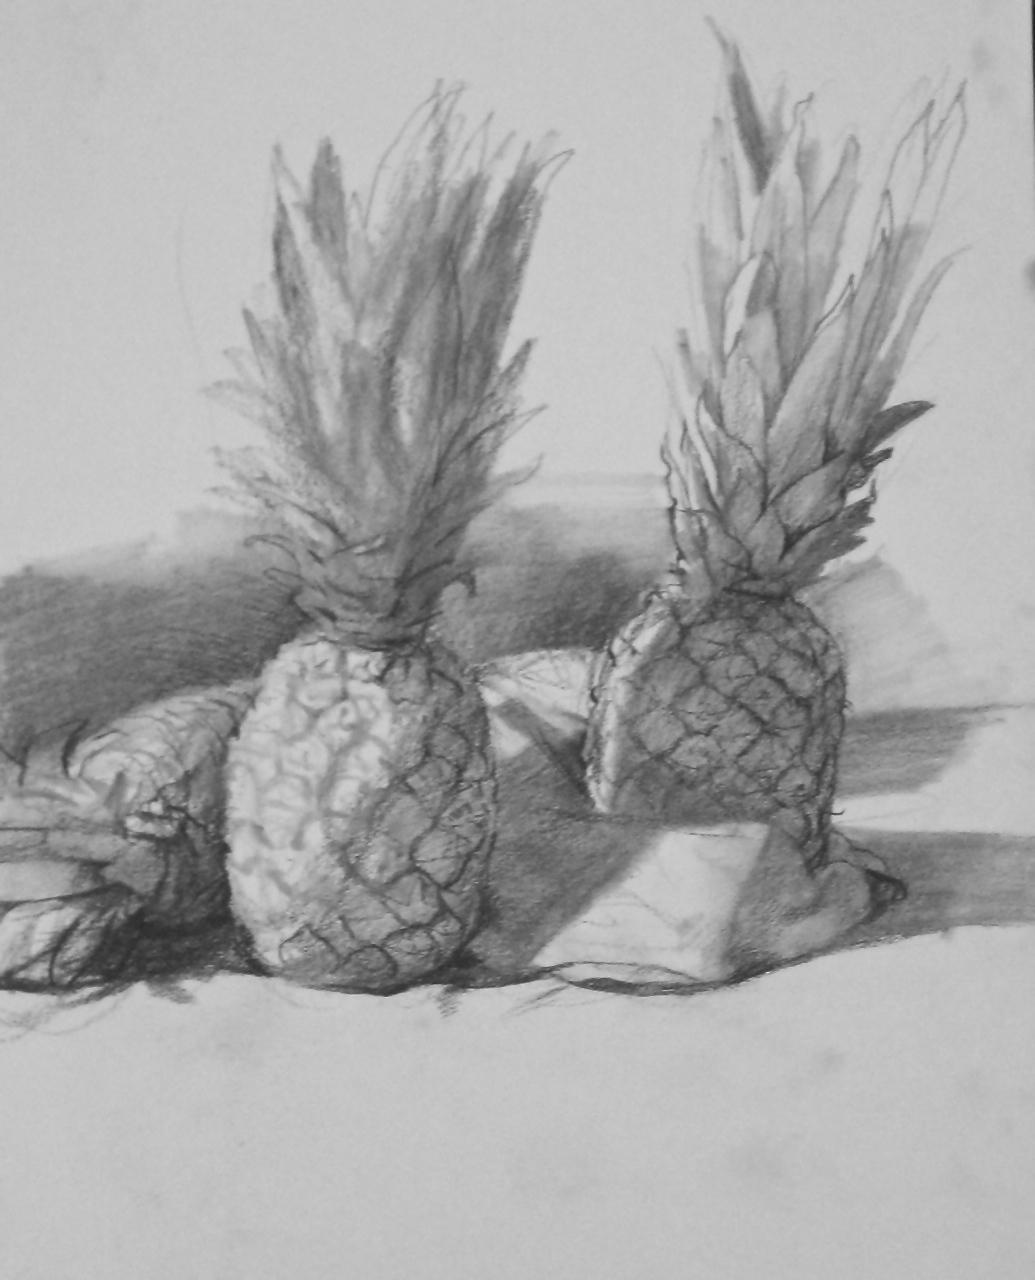 dessin drawing École d'art Pointe-Saint-Charles Art School